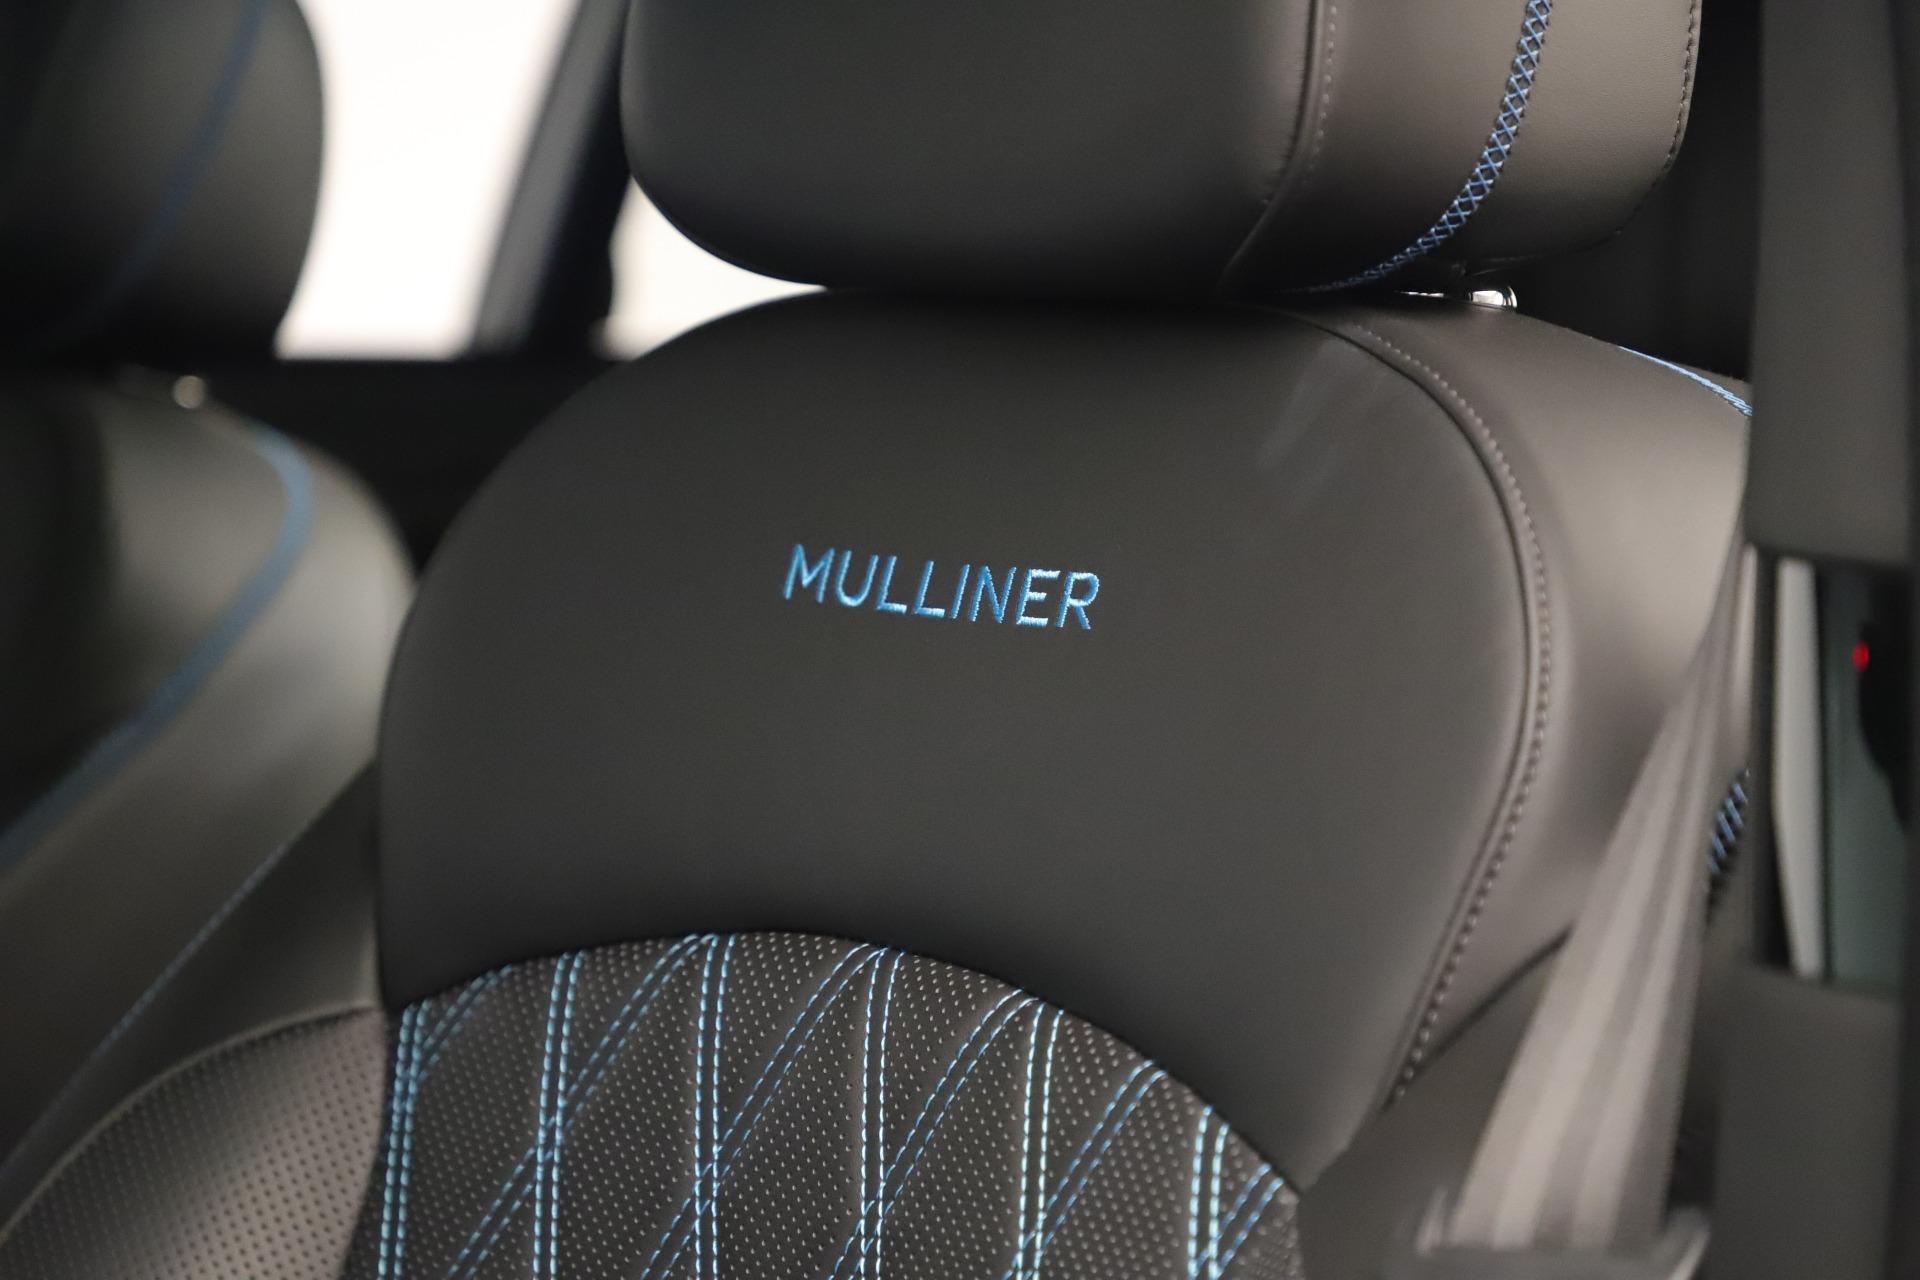 Used 2018 Bentley Mulsanne Speed Design Series For Sale In Westport, CT 3405_p21